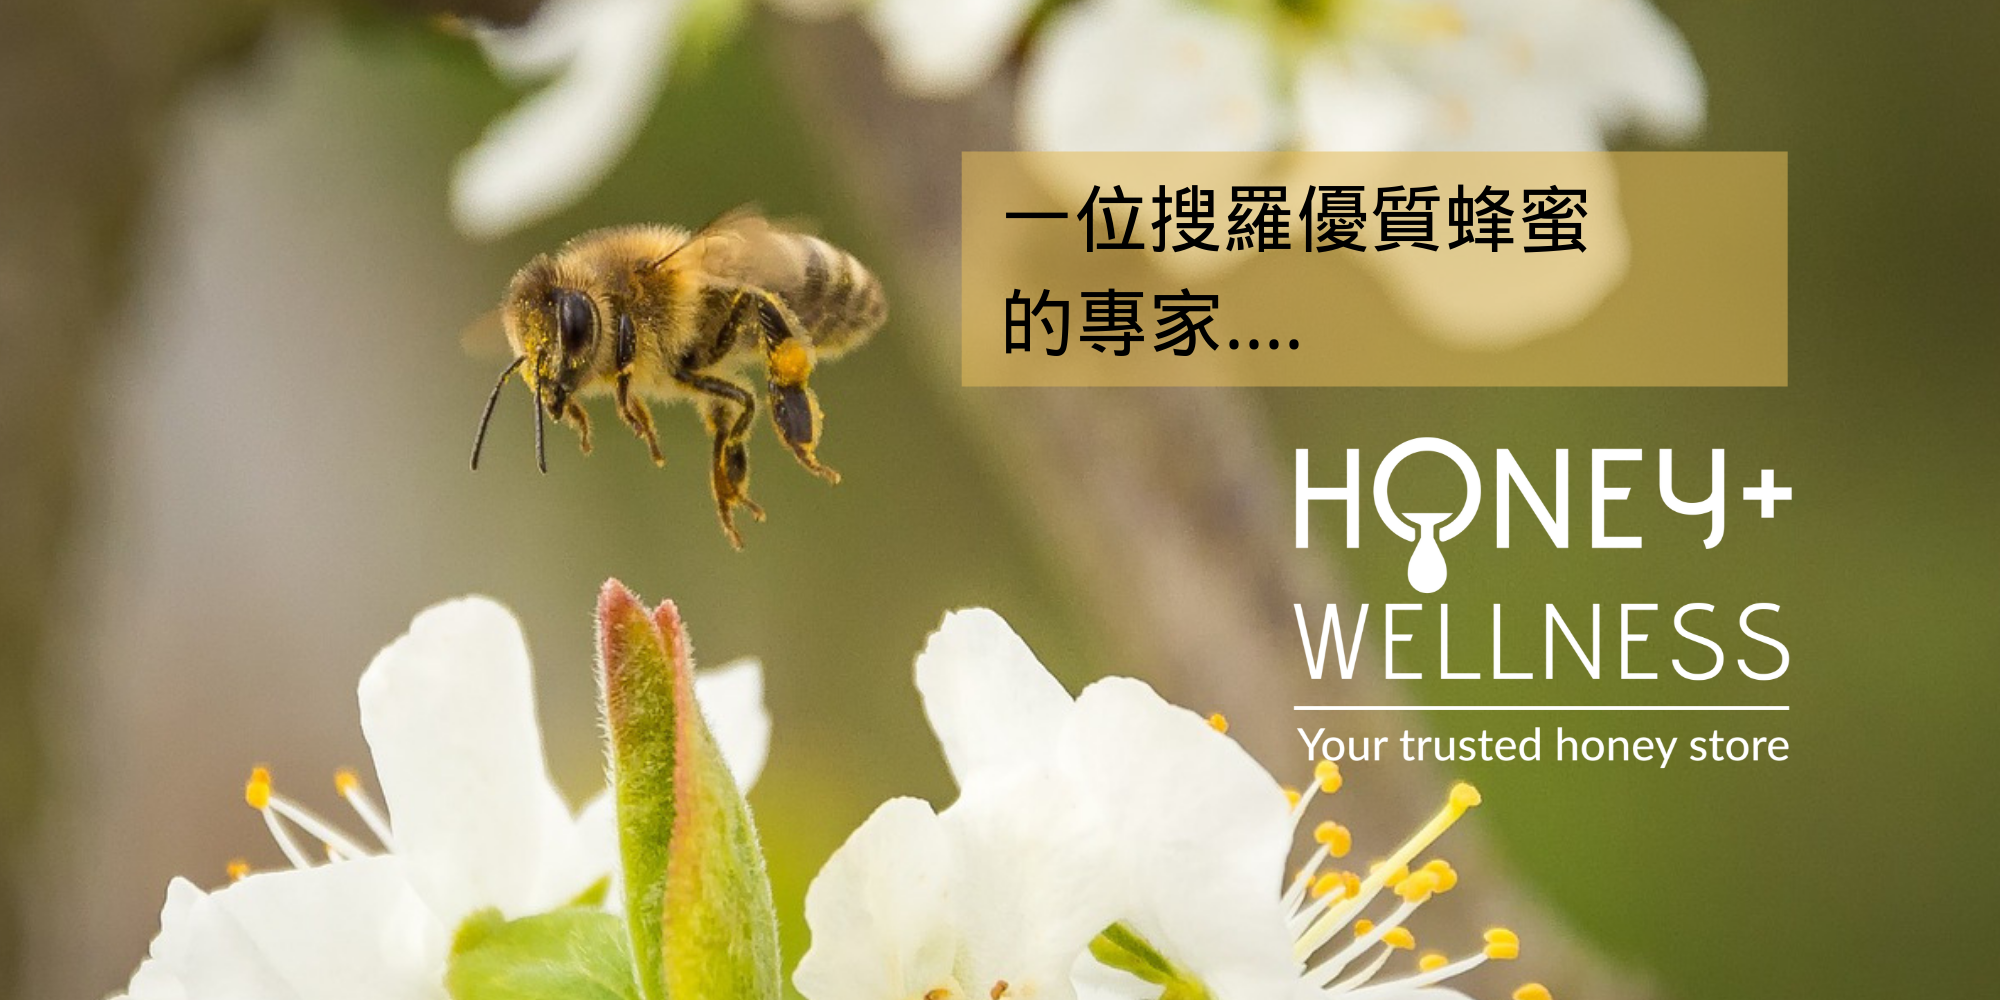 Honey And Wellness is an expert in sourcing premium honey